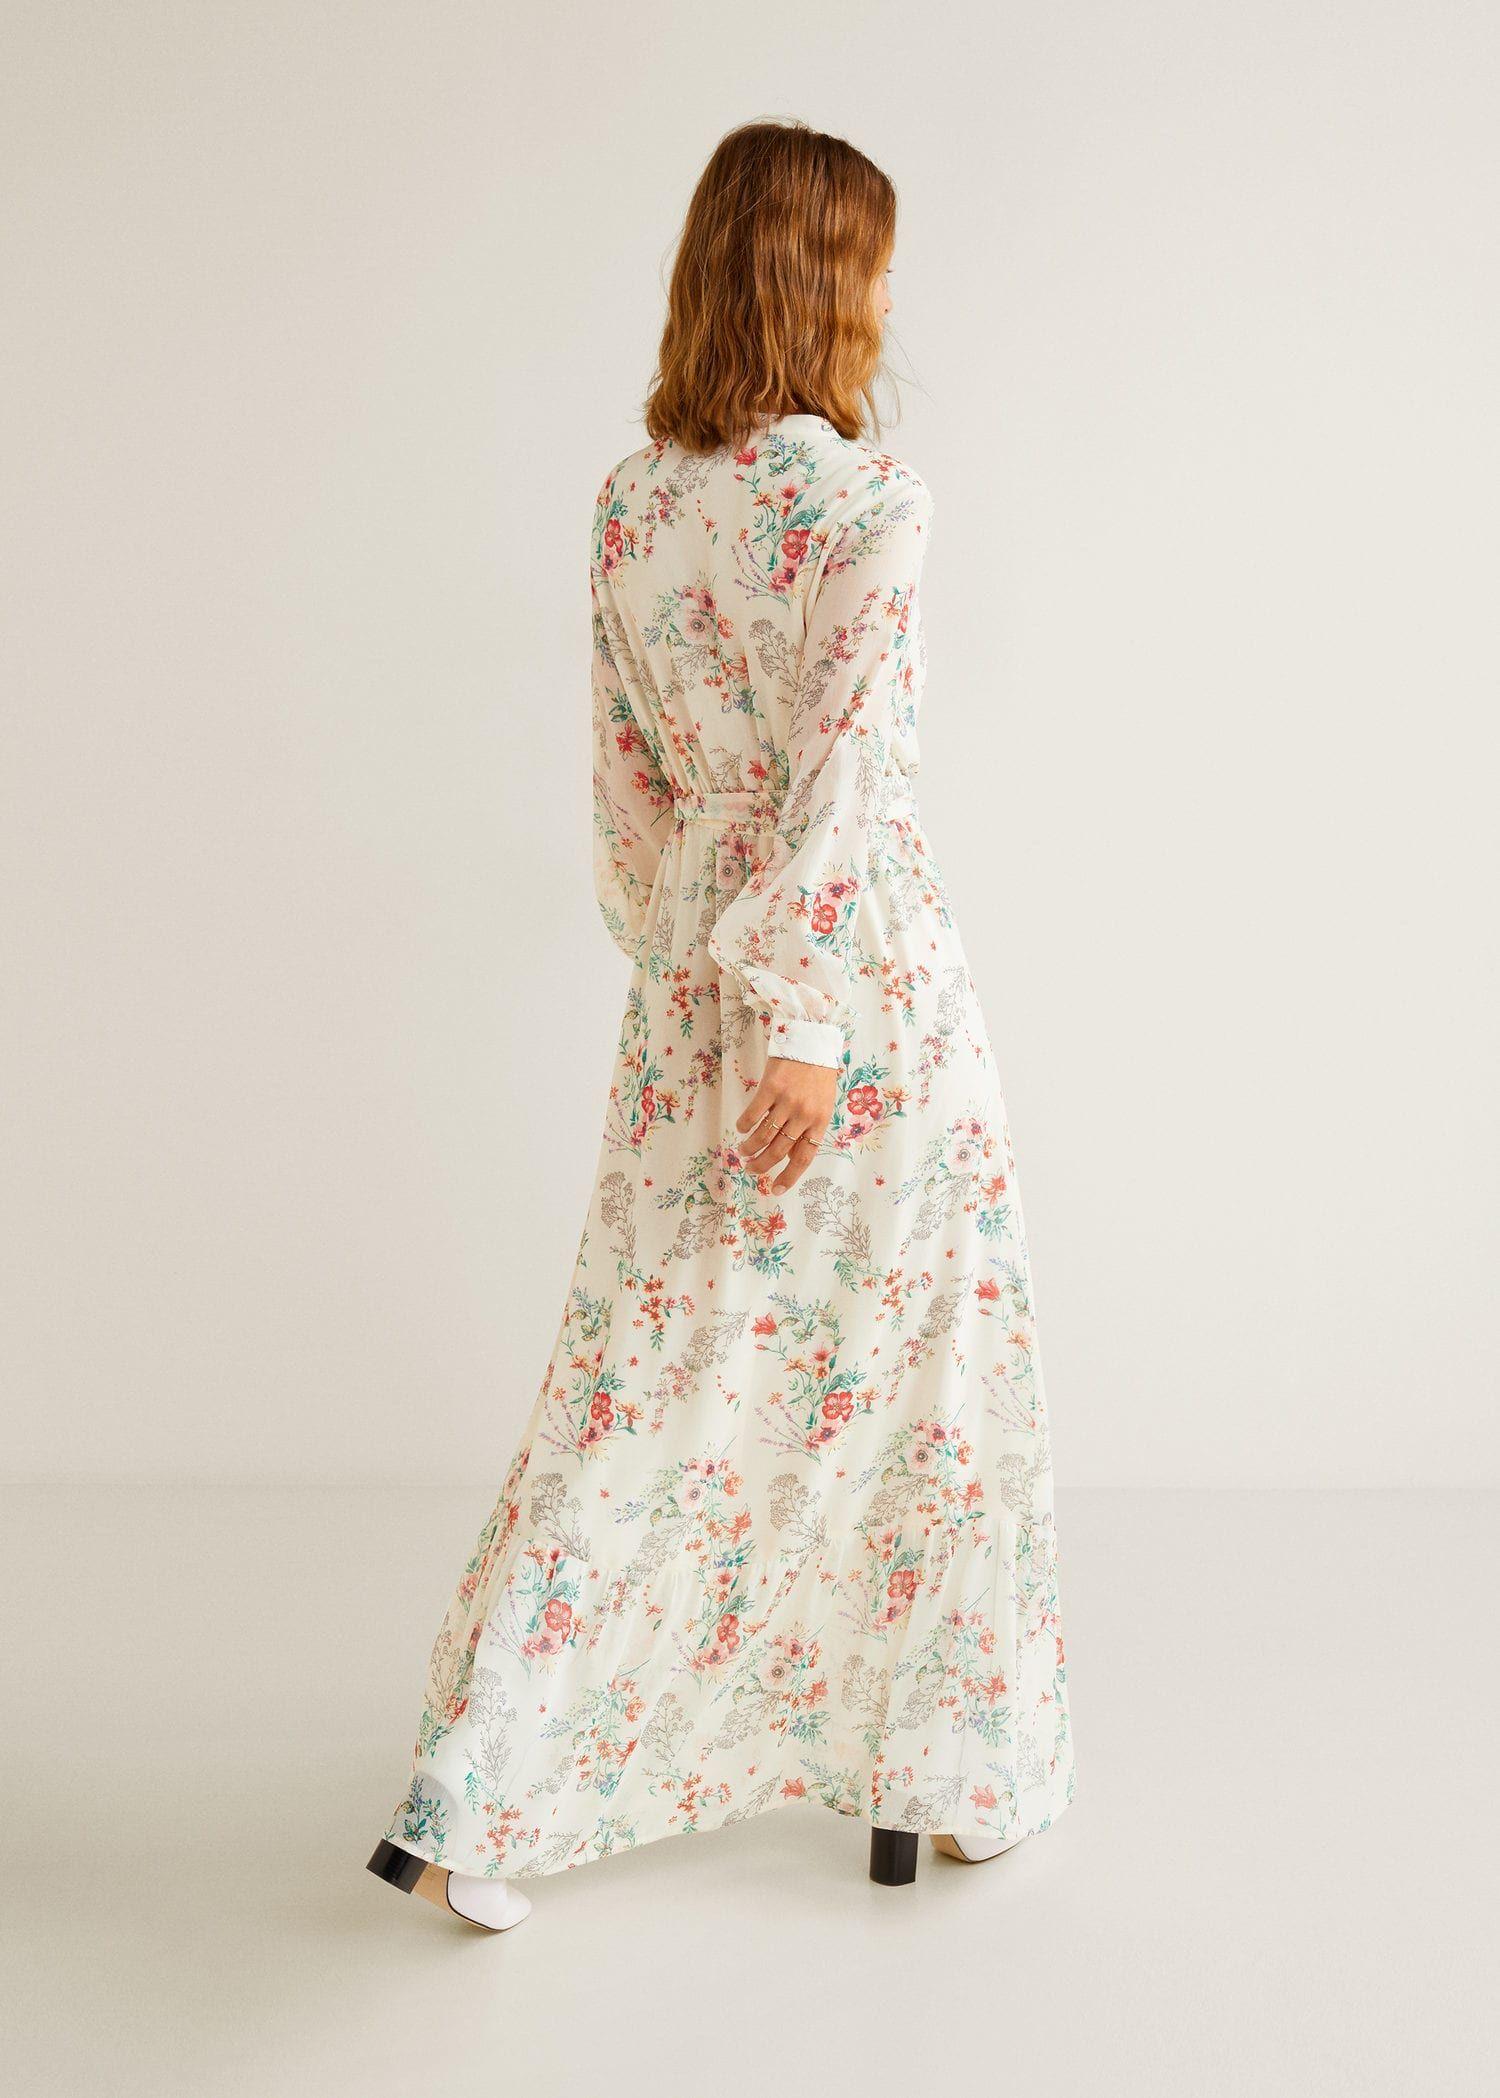 lange jurk met bloemen - dames | mango nederland | lange